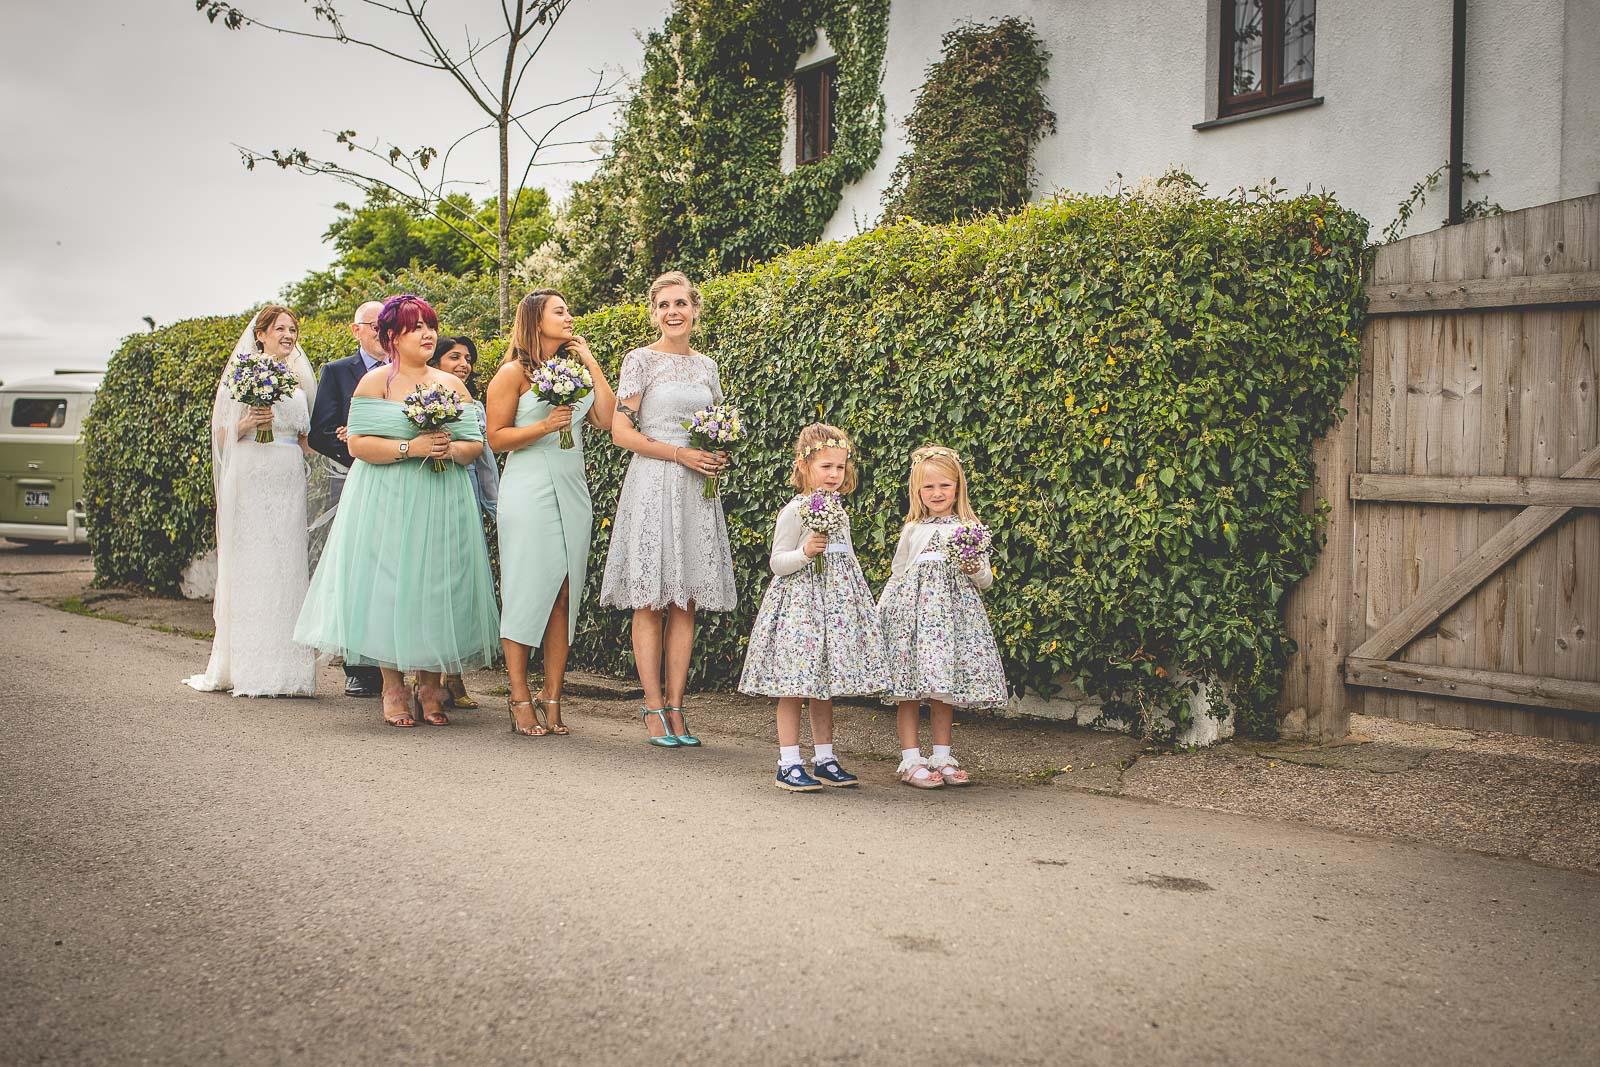 the old barn - clovelly - ugotthelove - wedding photography-7492.jpg